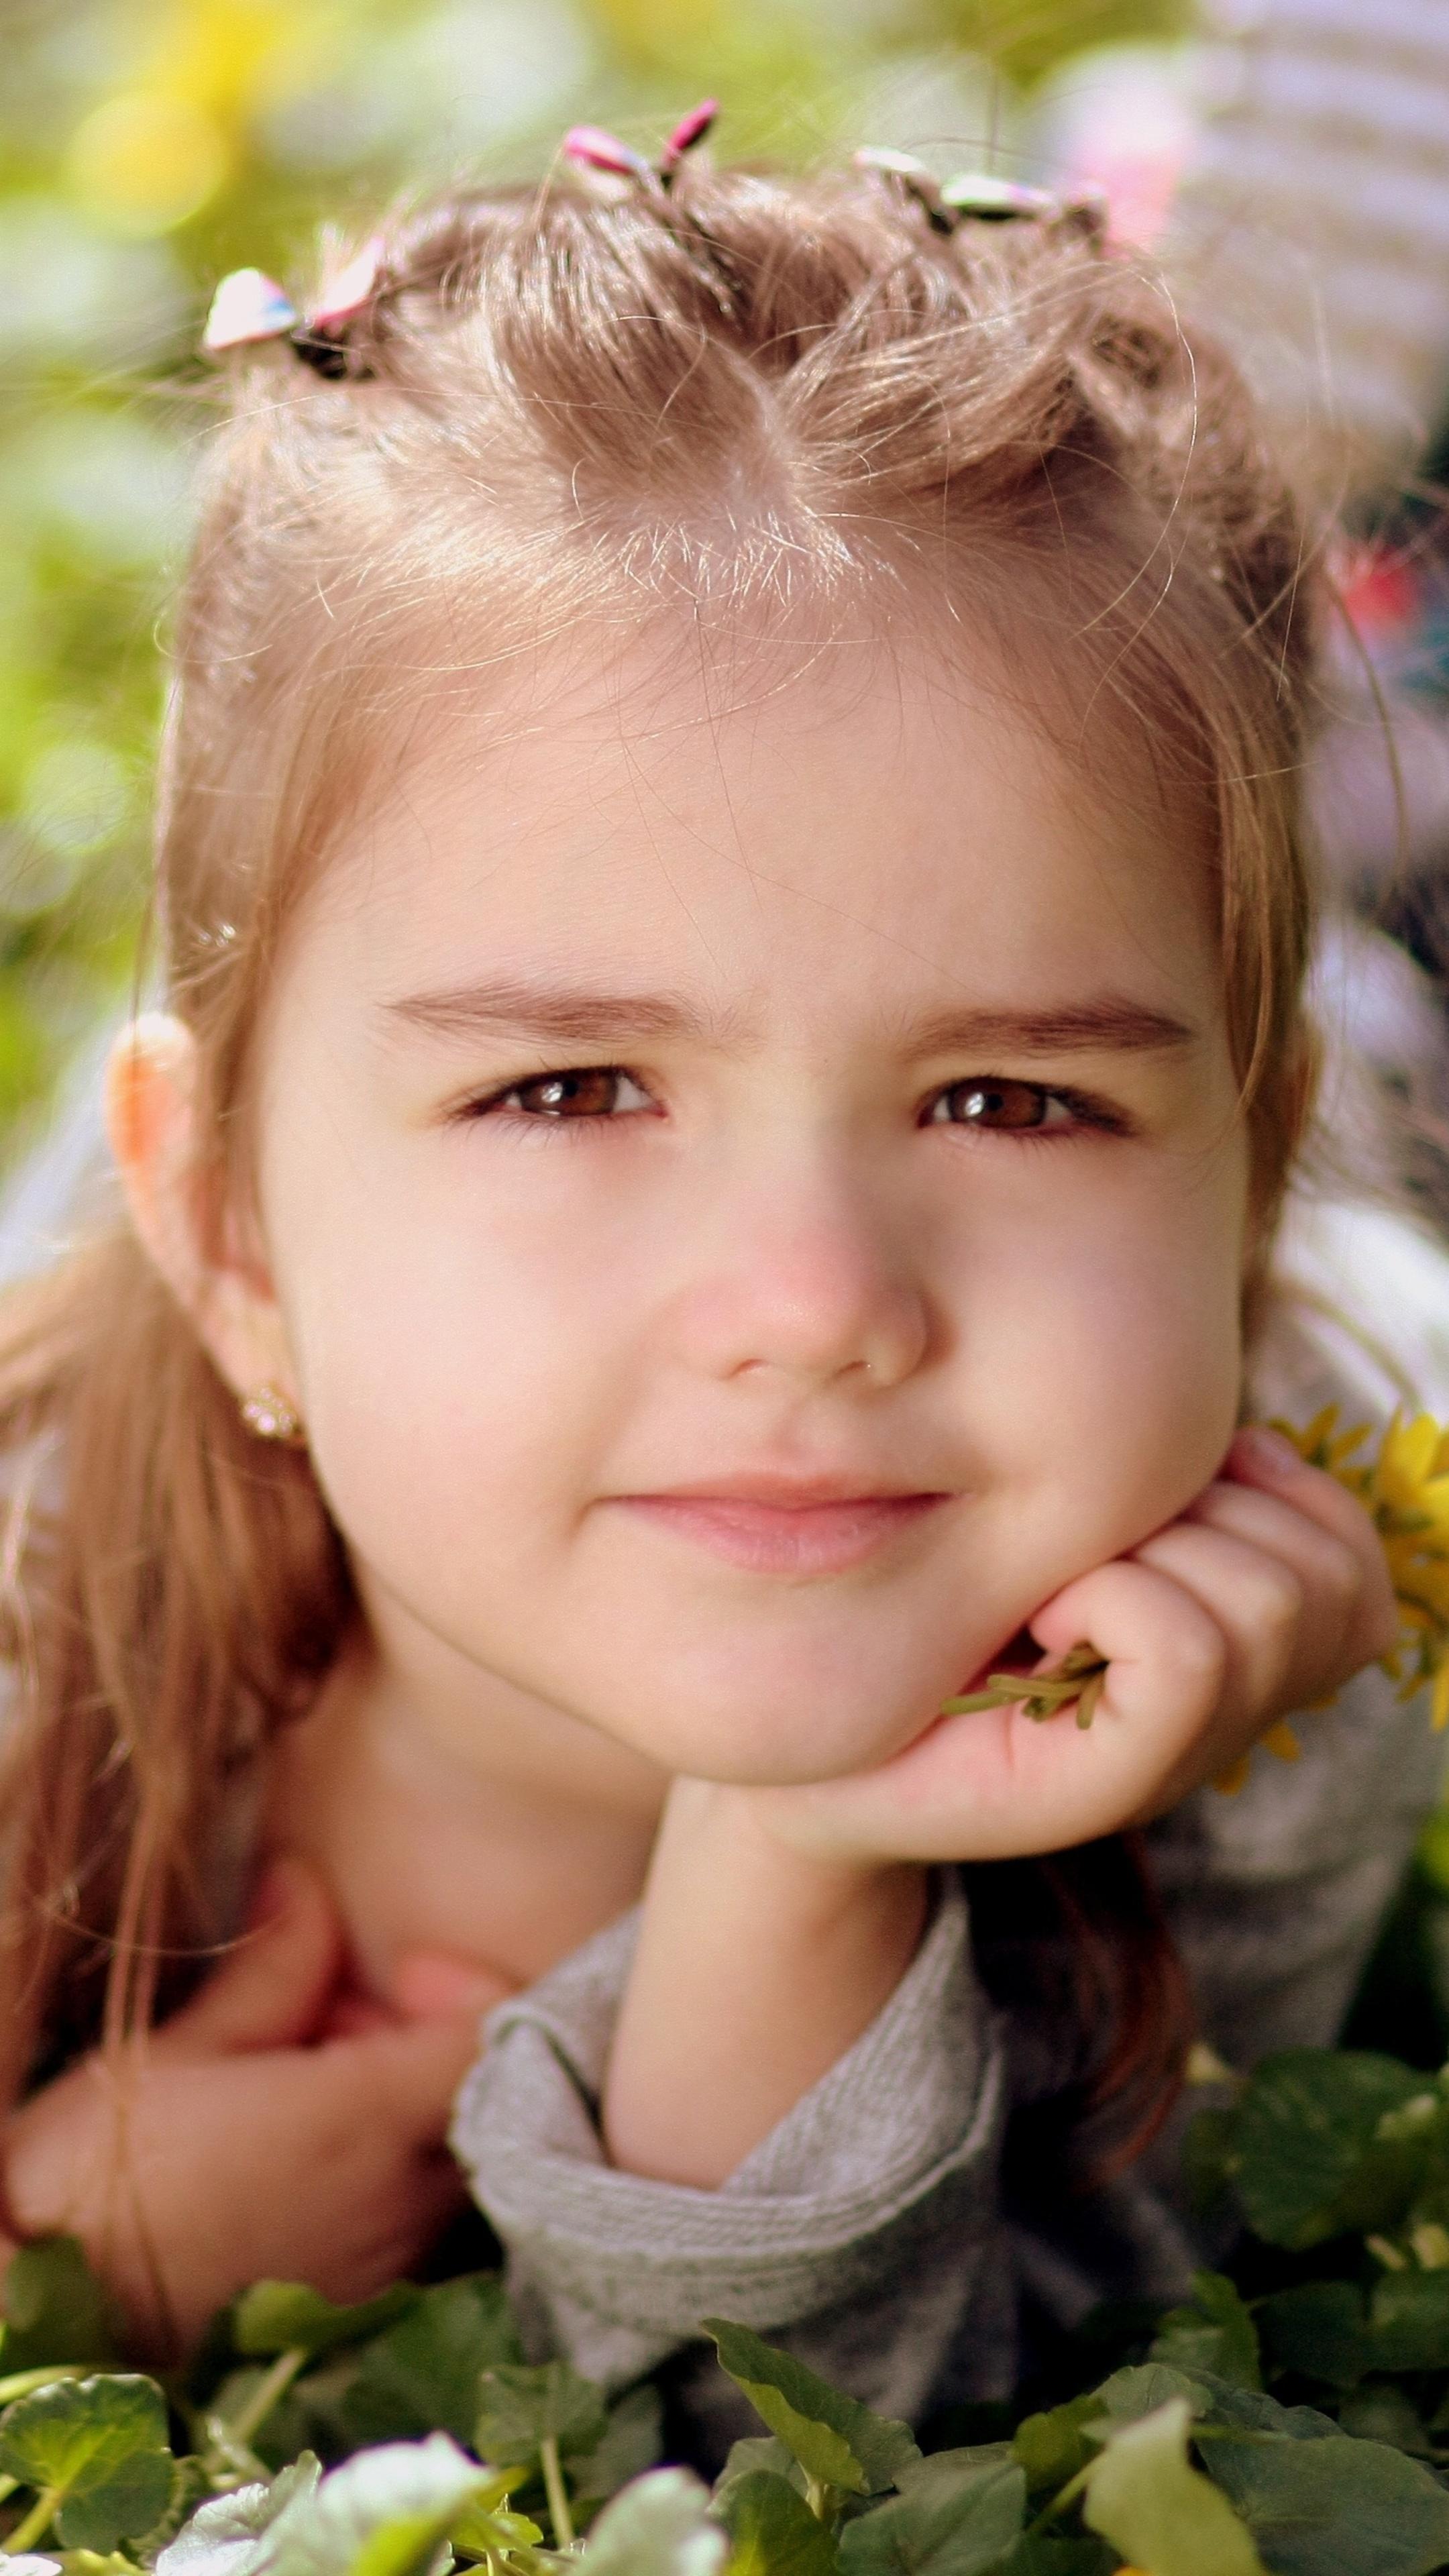 2160x3840 cute kid girl toddler sony xperia x,xz,z5 premium hd 4k